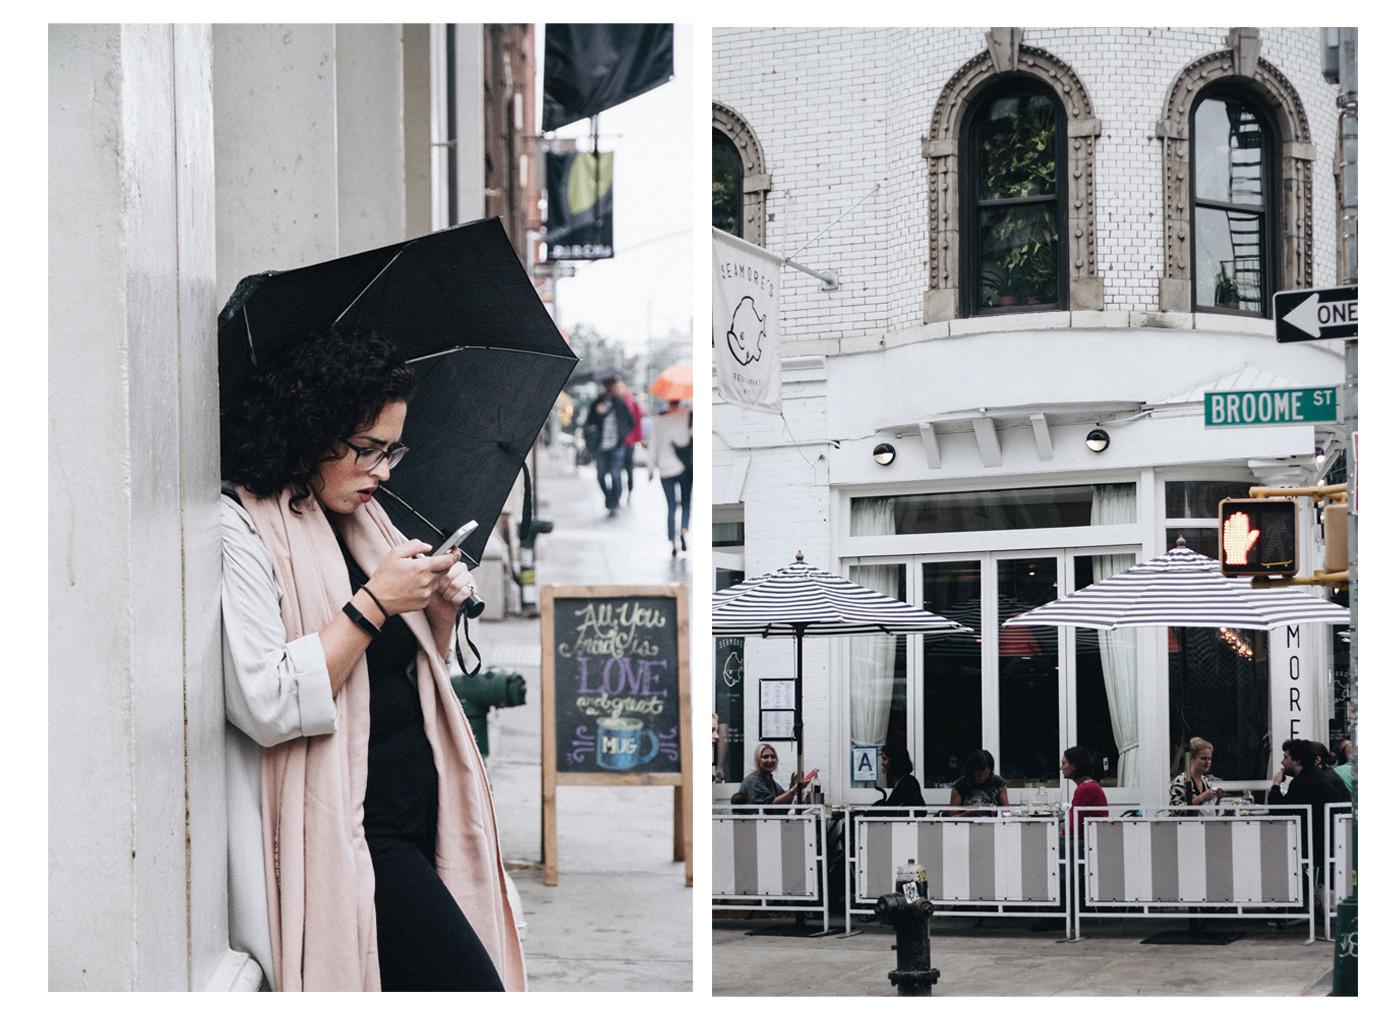 My friend waiting under the rain with her cute umbrella